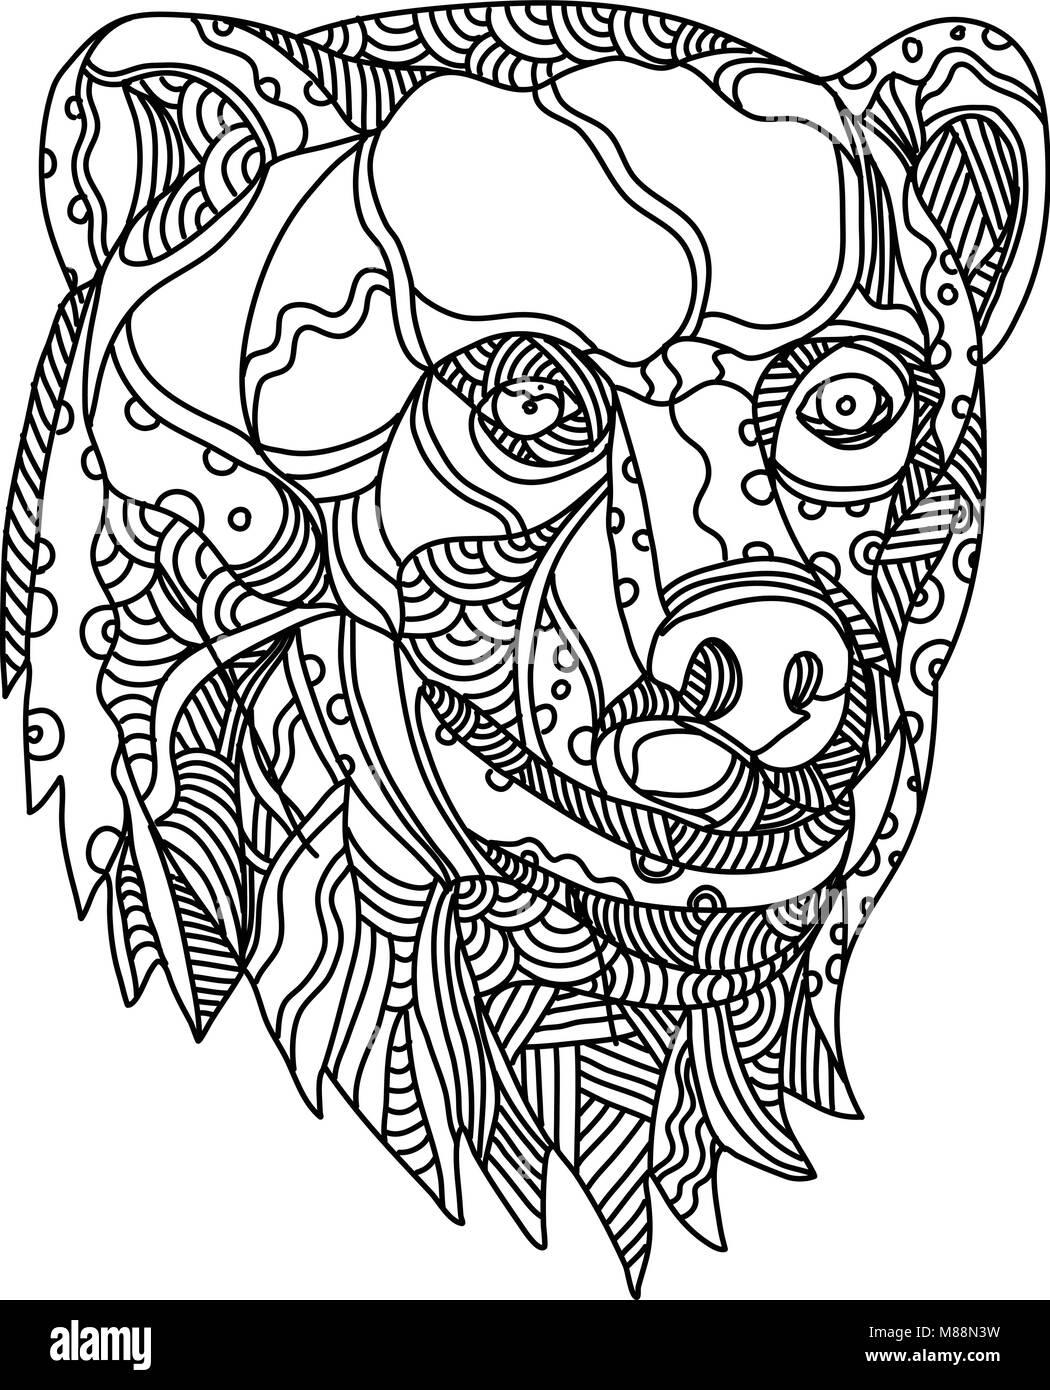 Doodle Art Illustration De La Cabeza De Un Oso Pardo Carnivoran